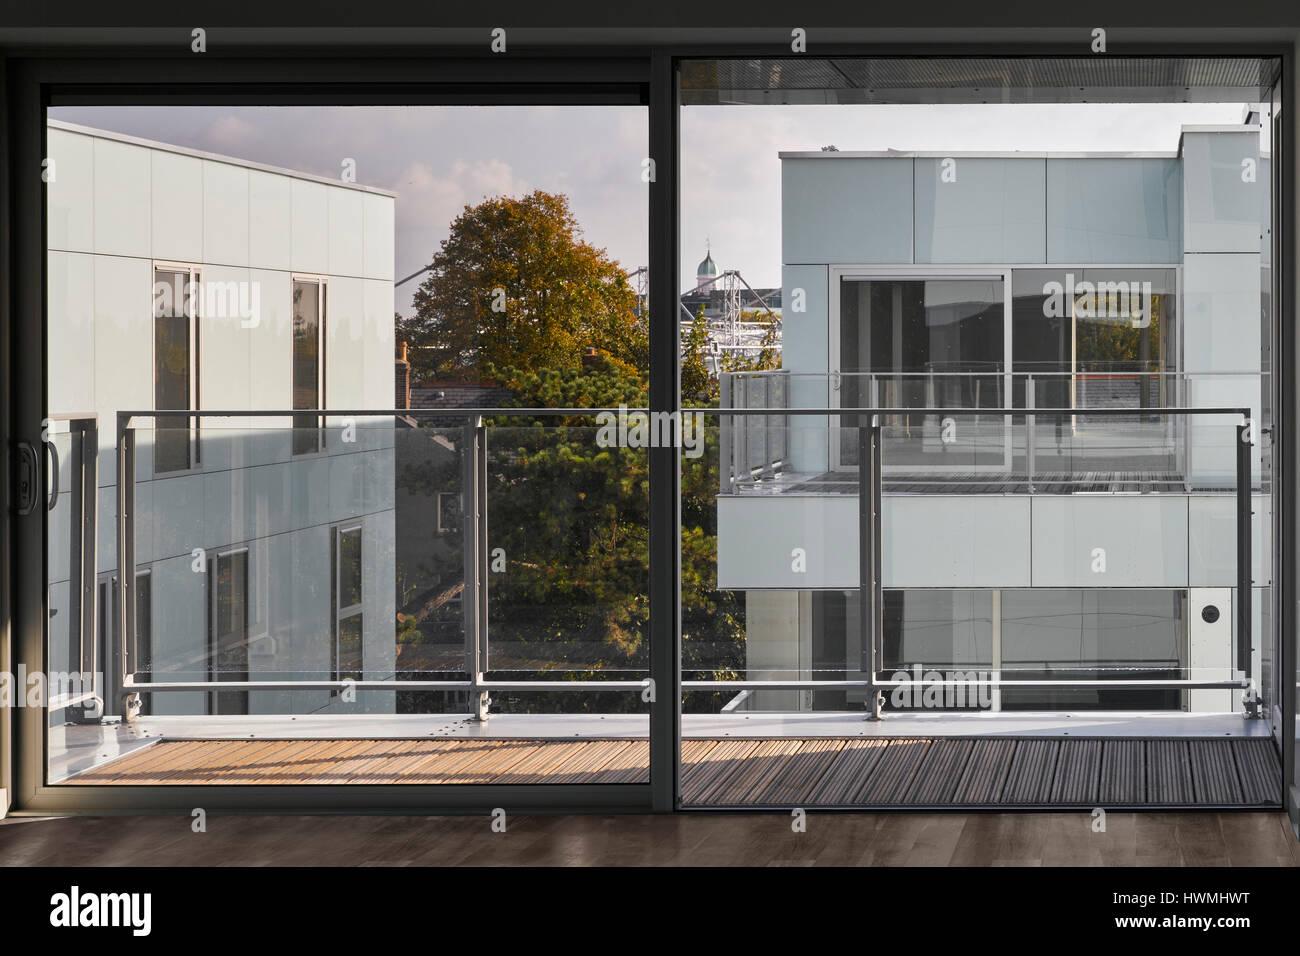 Interior View Of Third Floor Apartment Showing Glass Sliding Doors